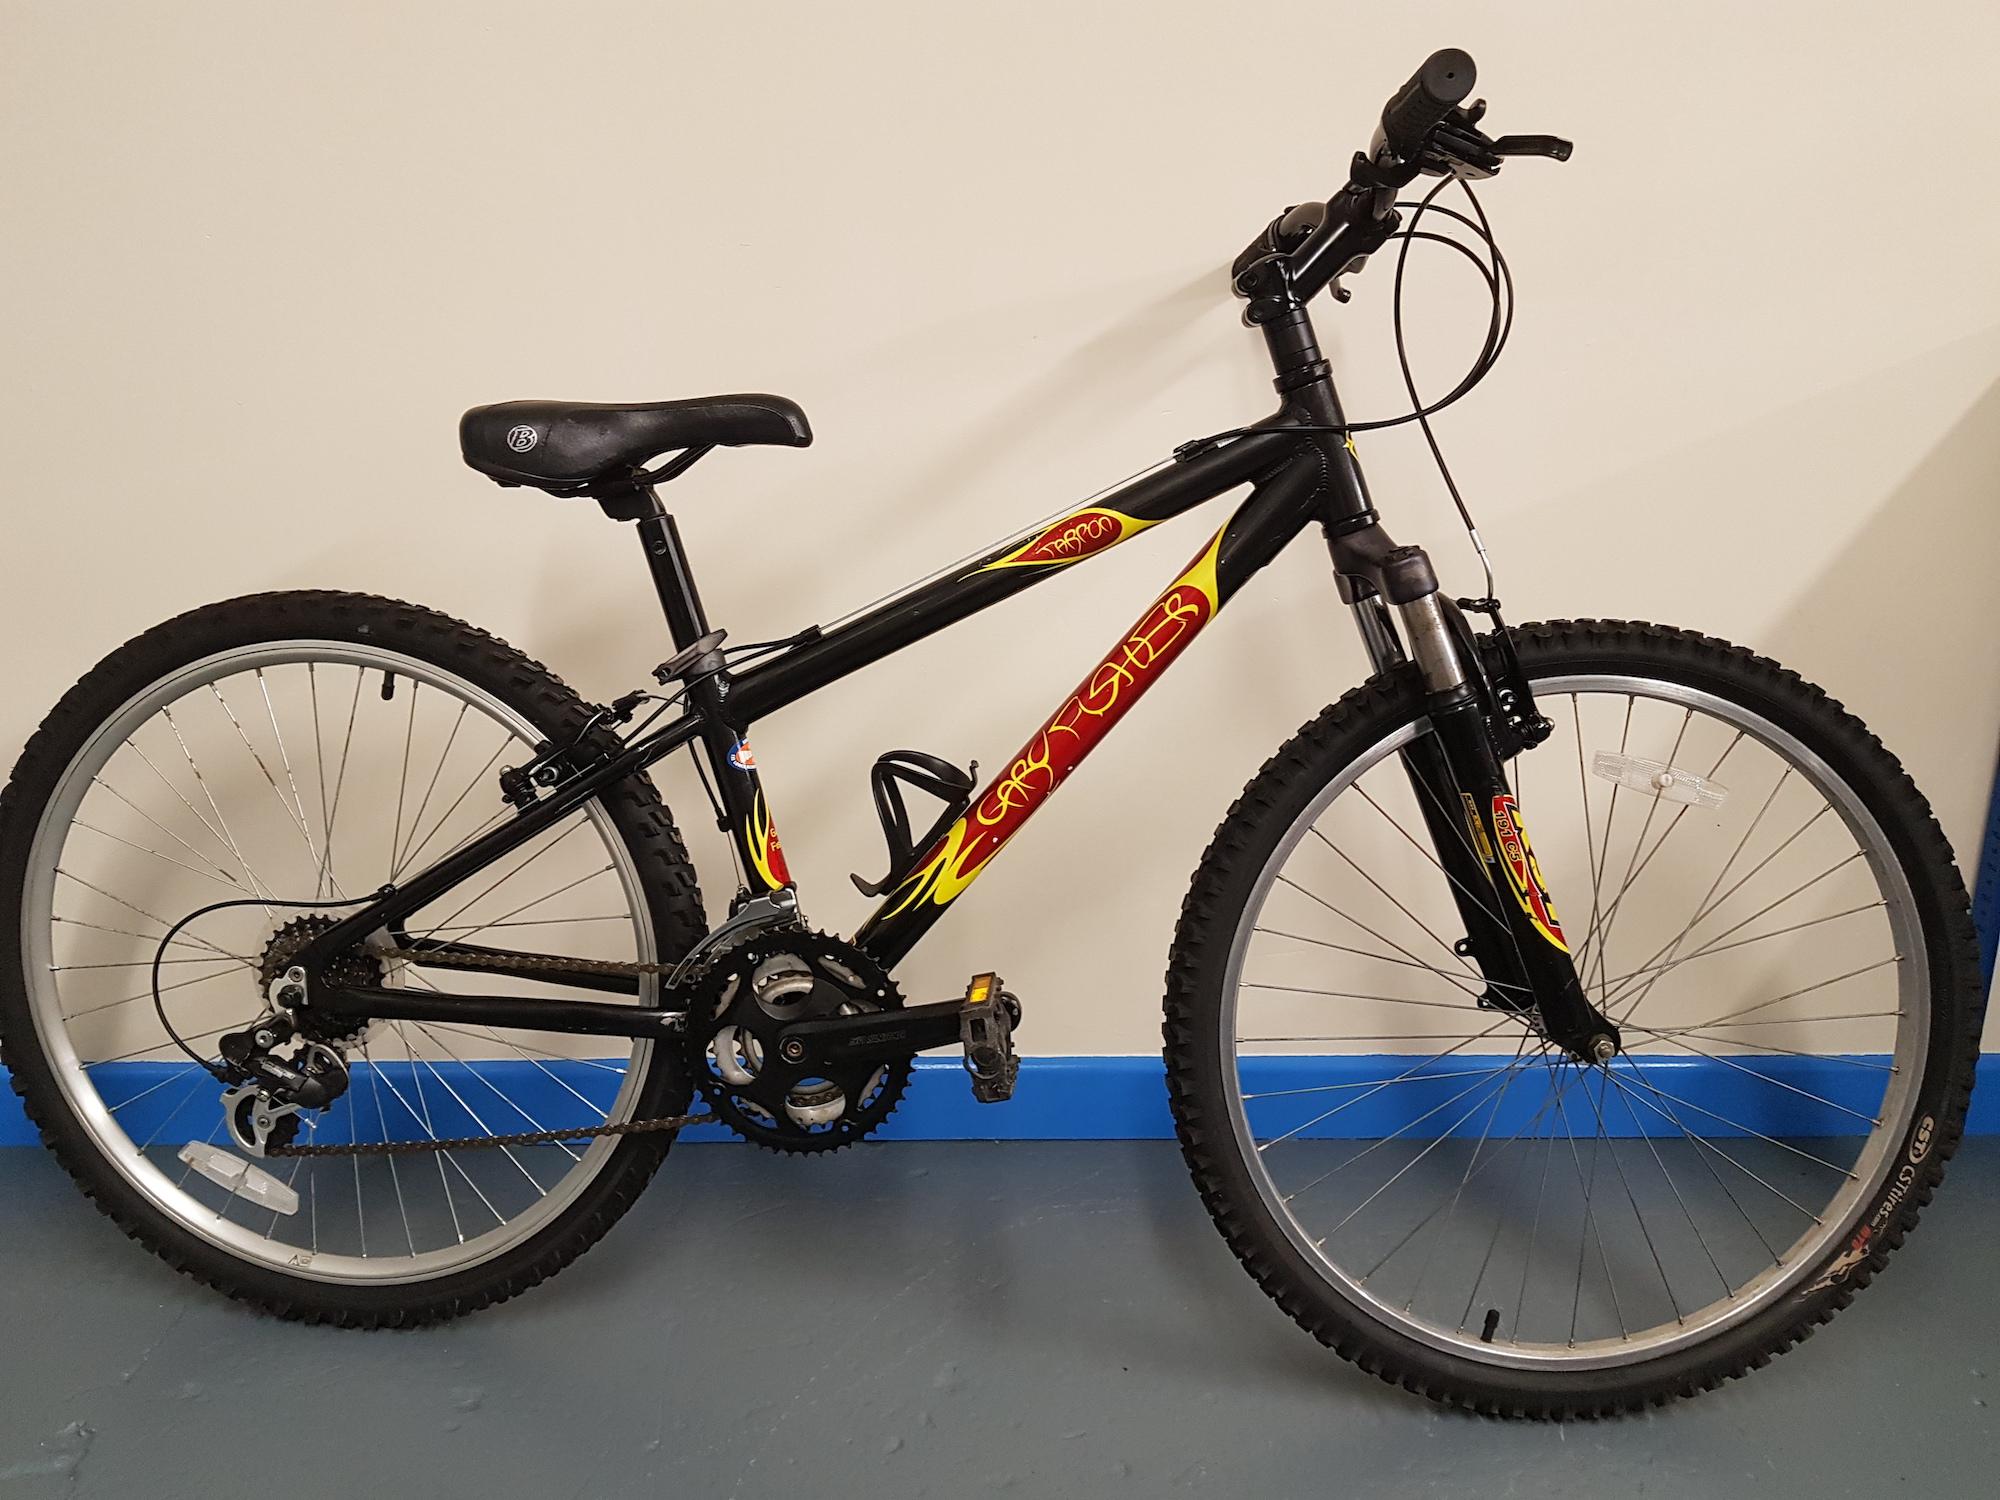 Black Mountain bike against a plain background